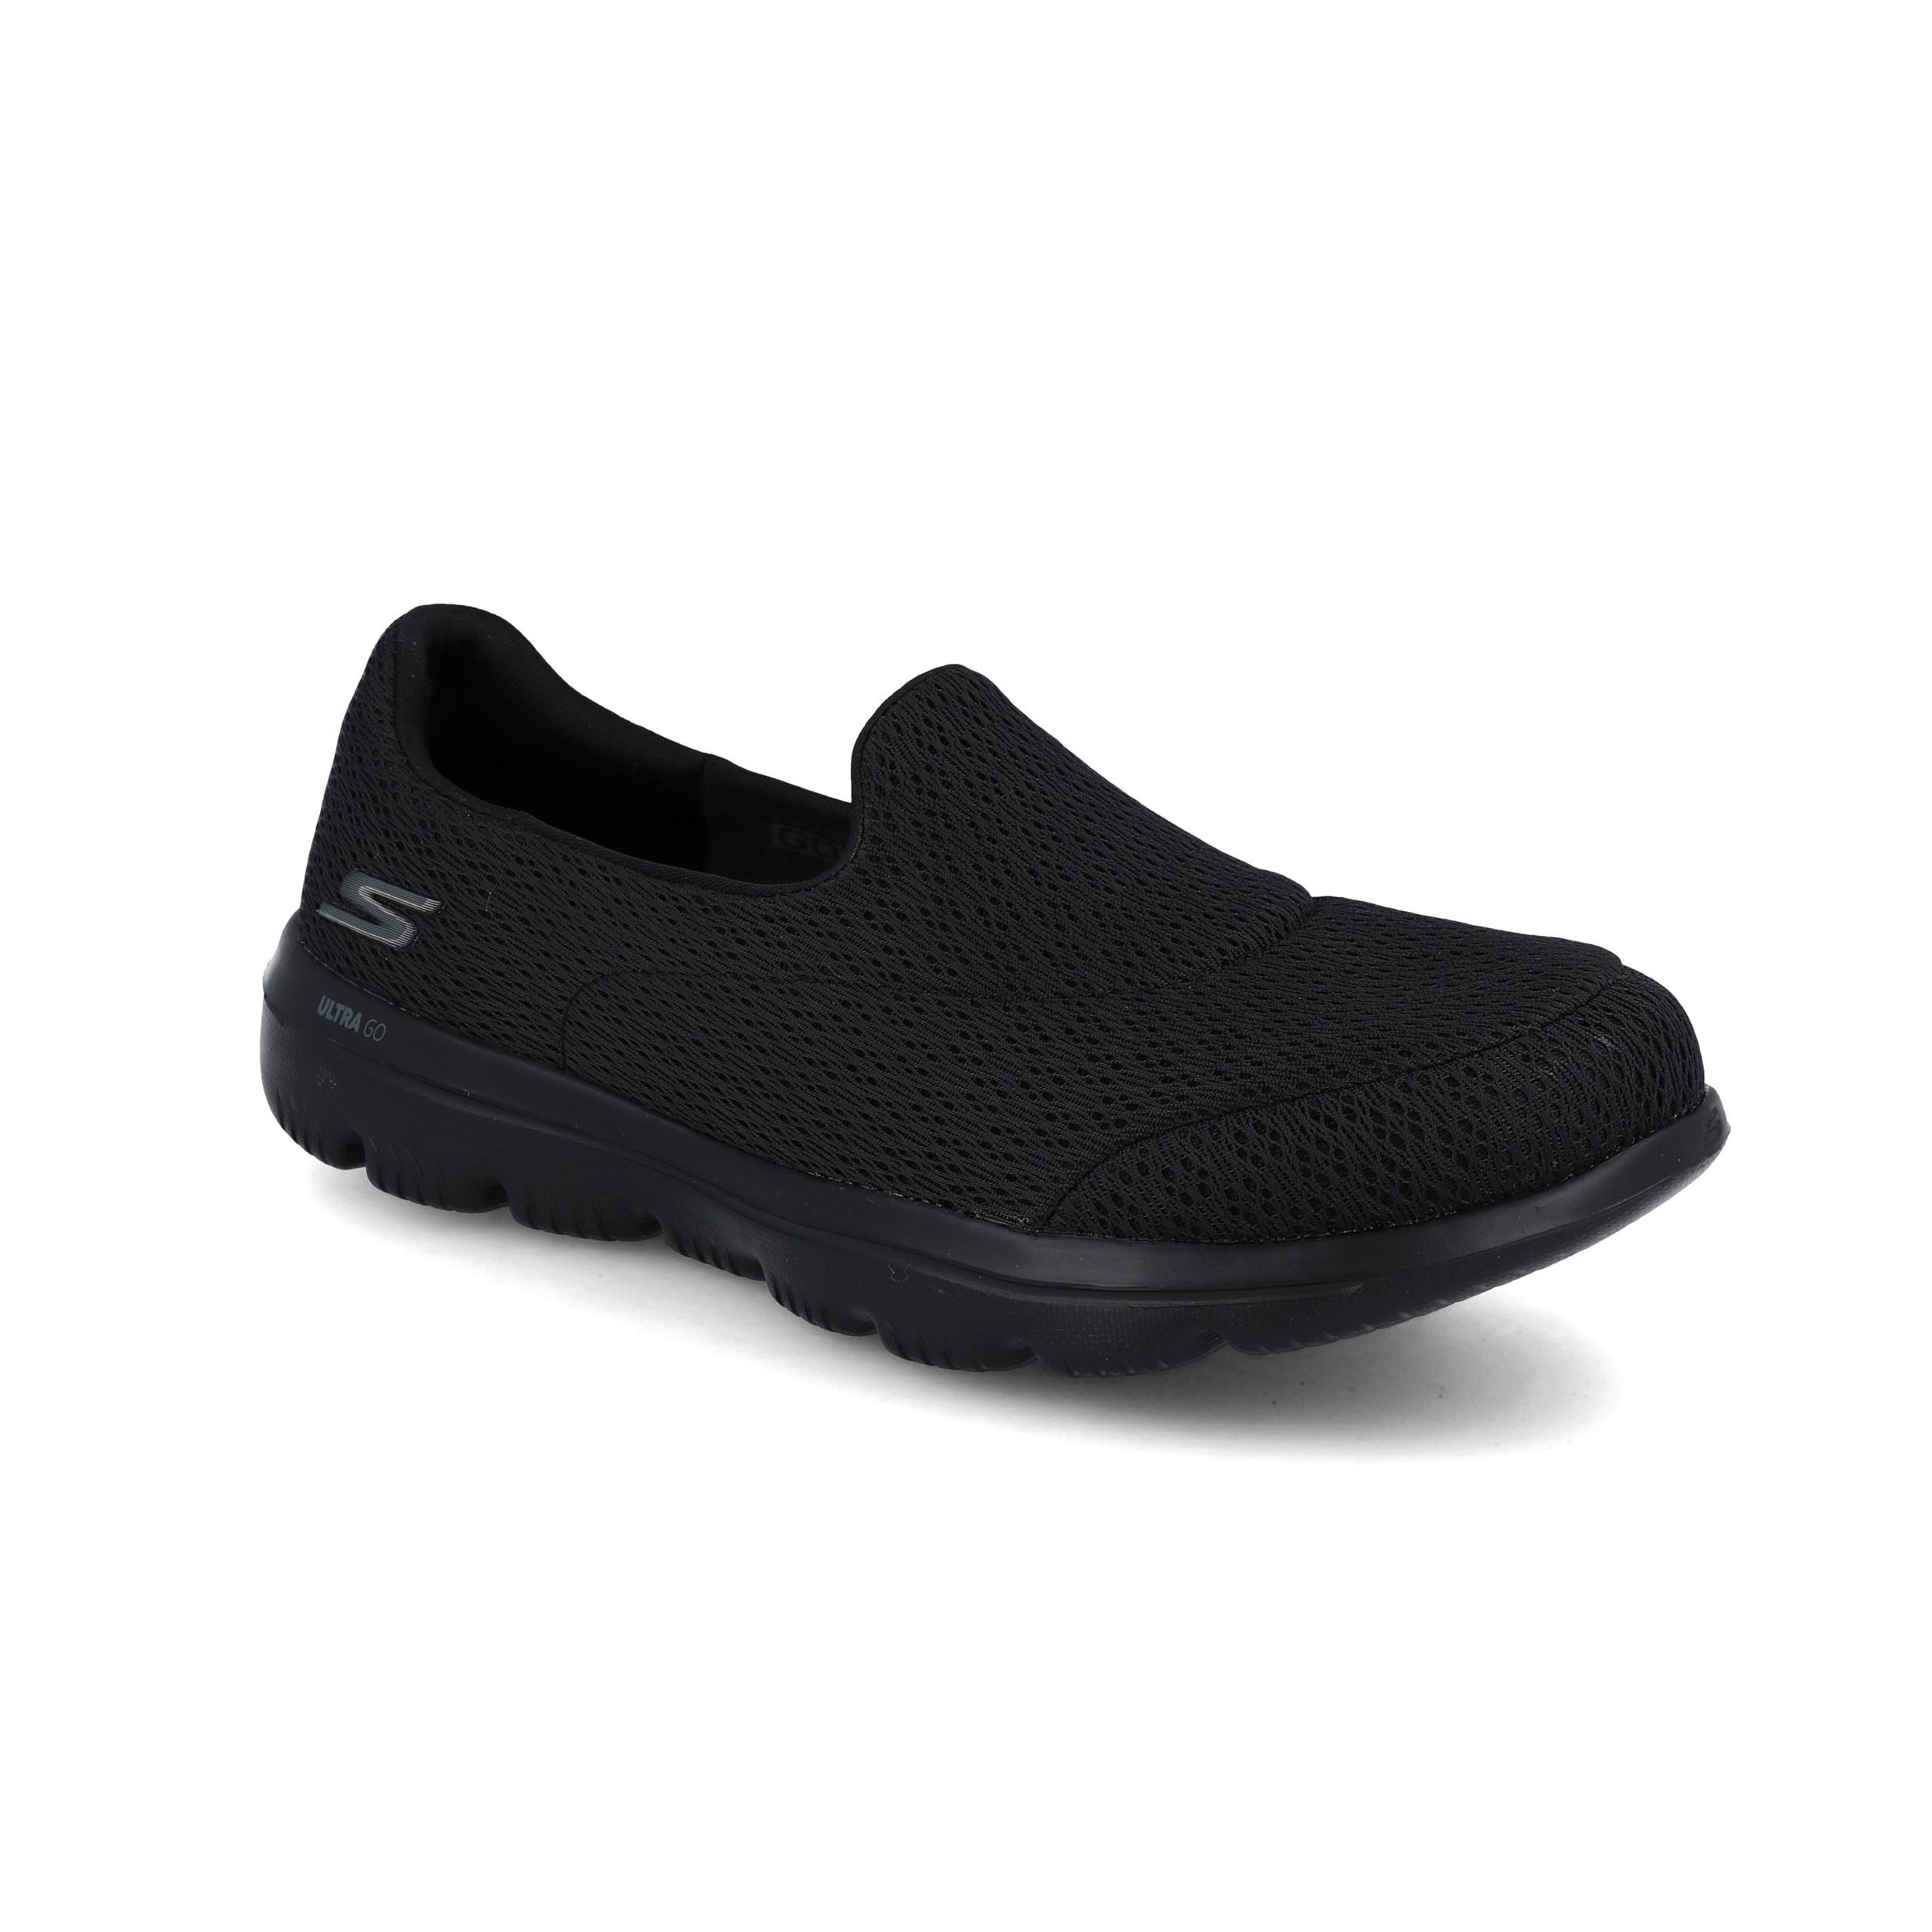 Skechers Femme Gowalk Evolution Ultra Chaussures Violet Sports Extérieur Respirant